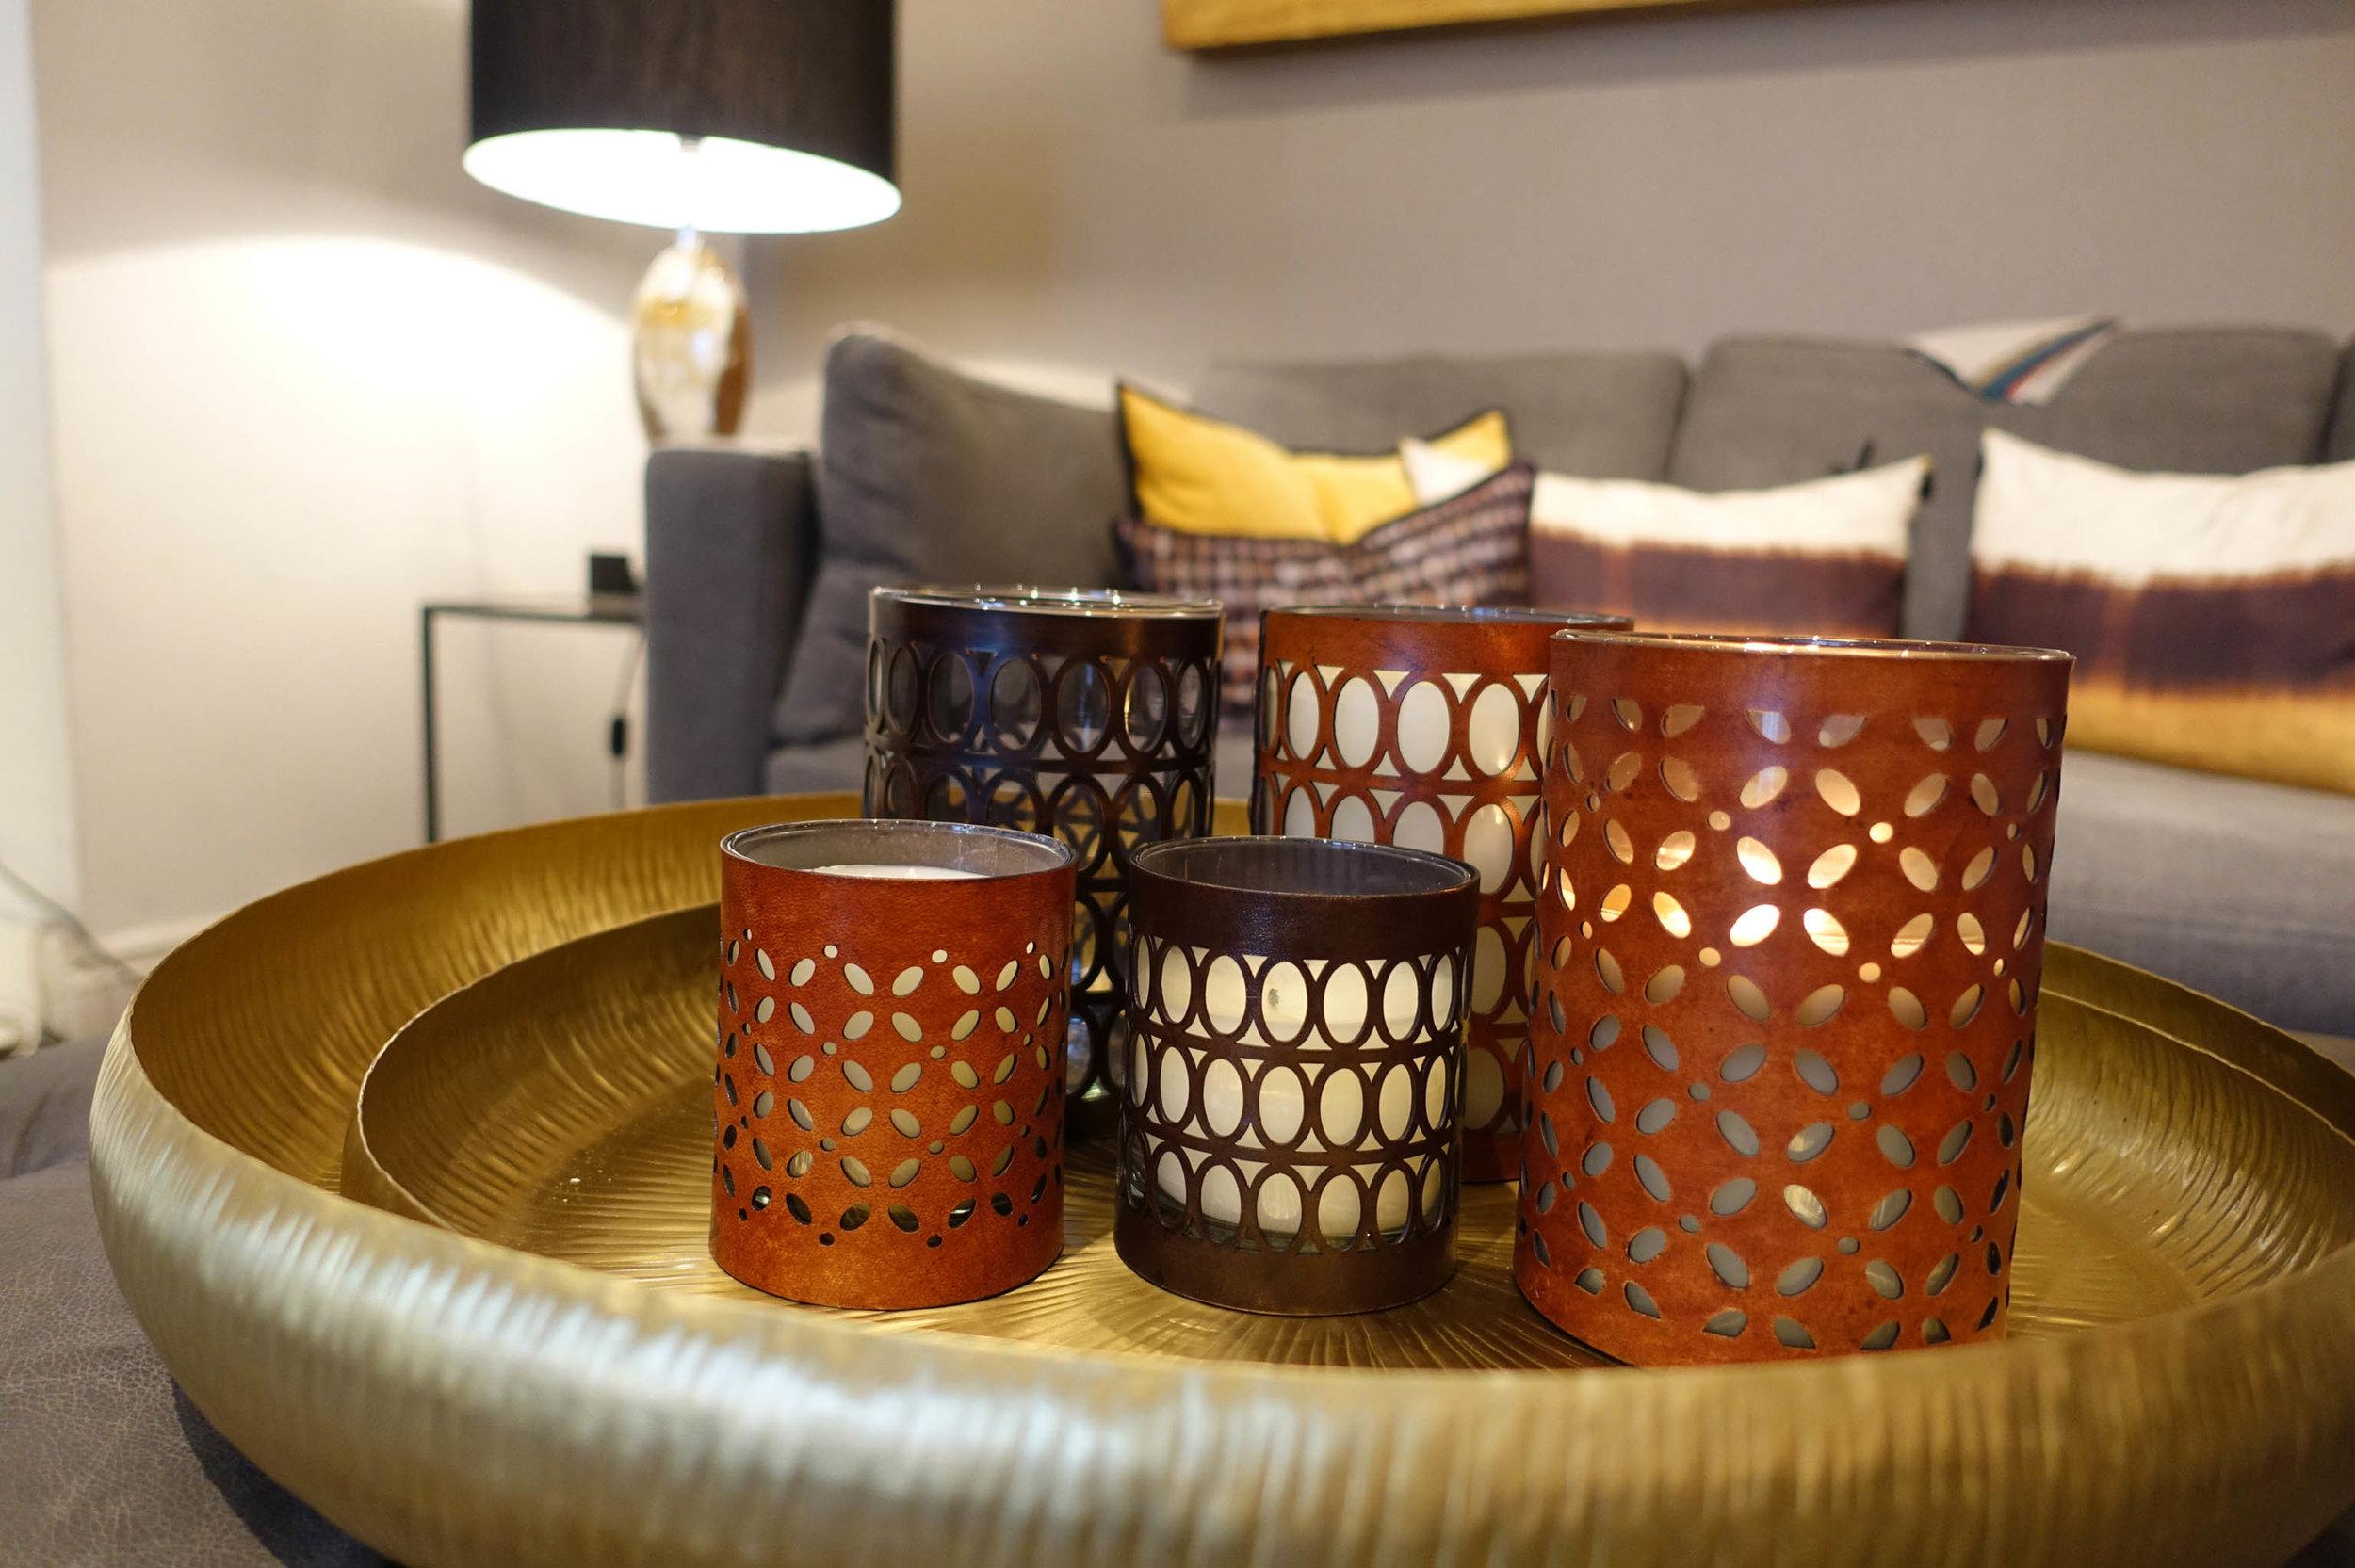 The Shikari Candle Range  has a beautiful scent with notes of bergamot, mandarin, choisya, cedar and amber.